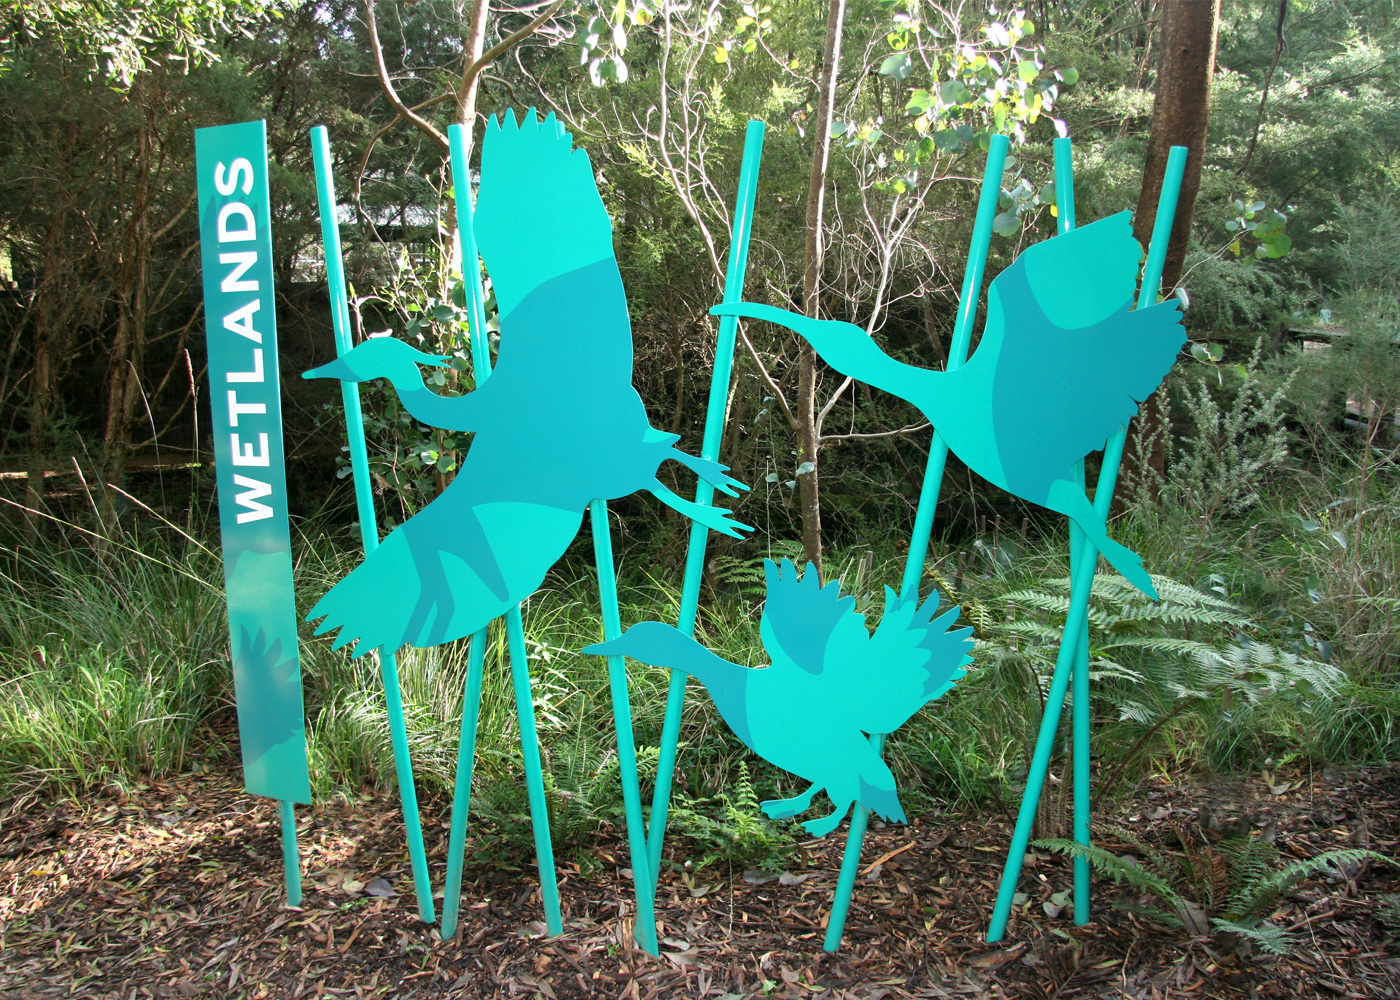 Zoo's Victoria - Healesville Sanctuary